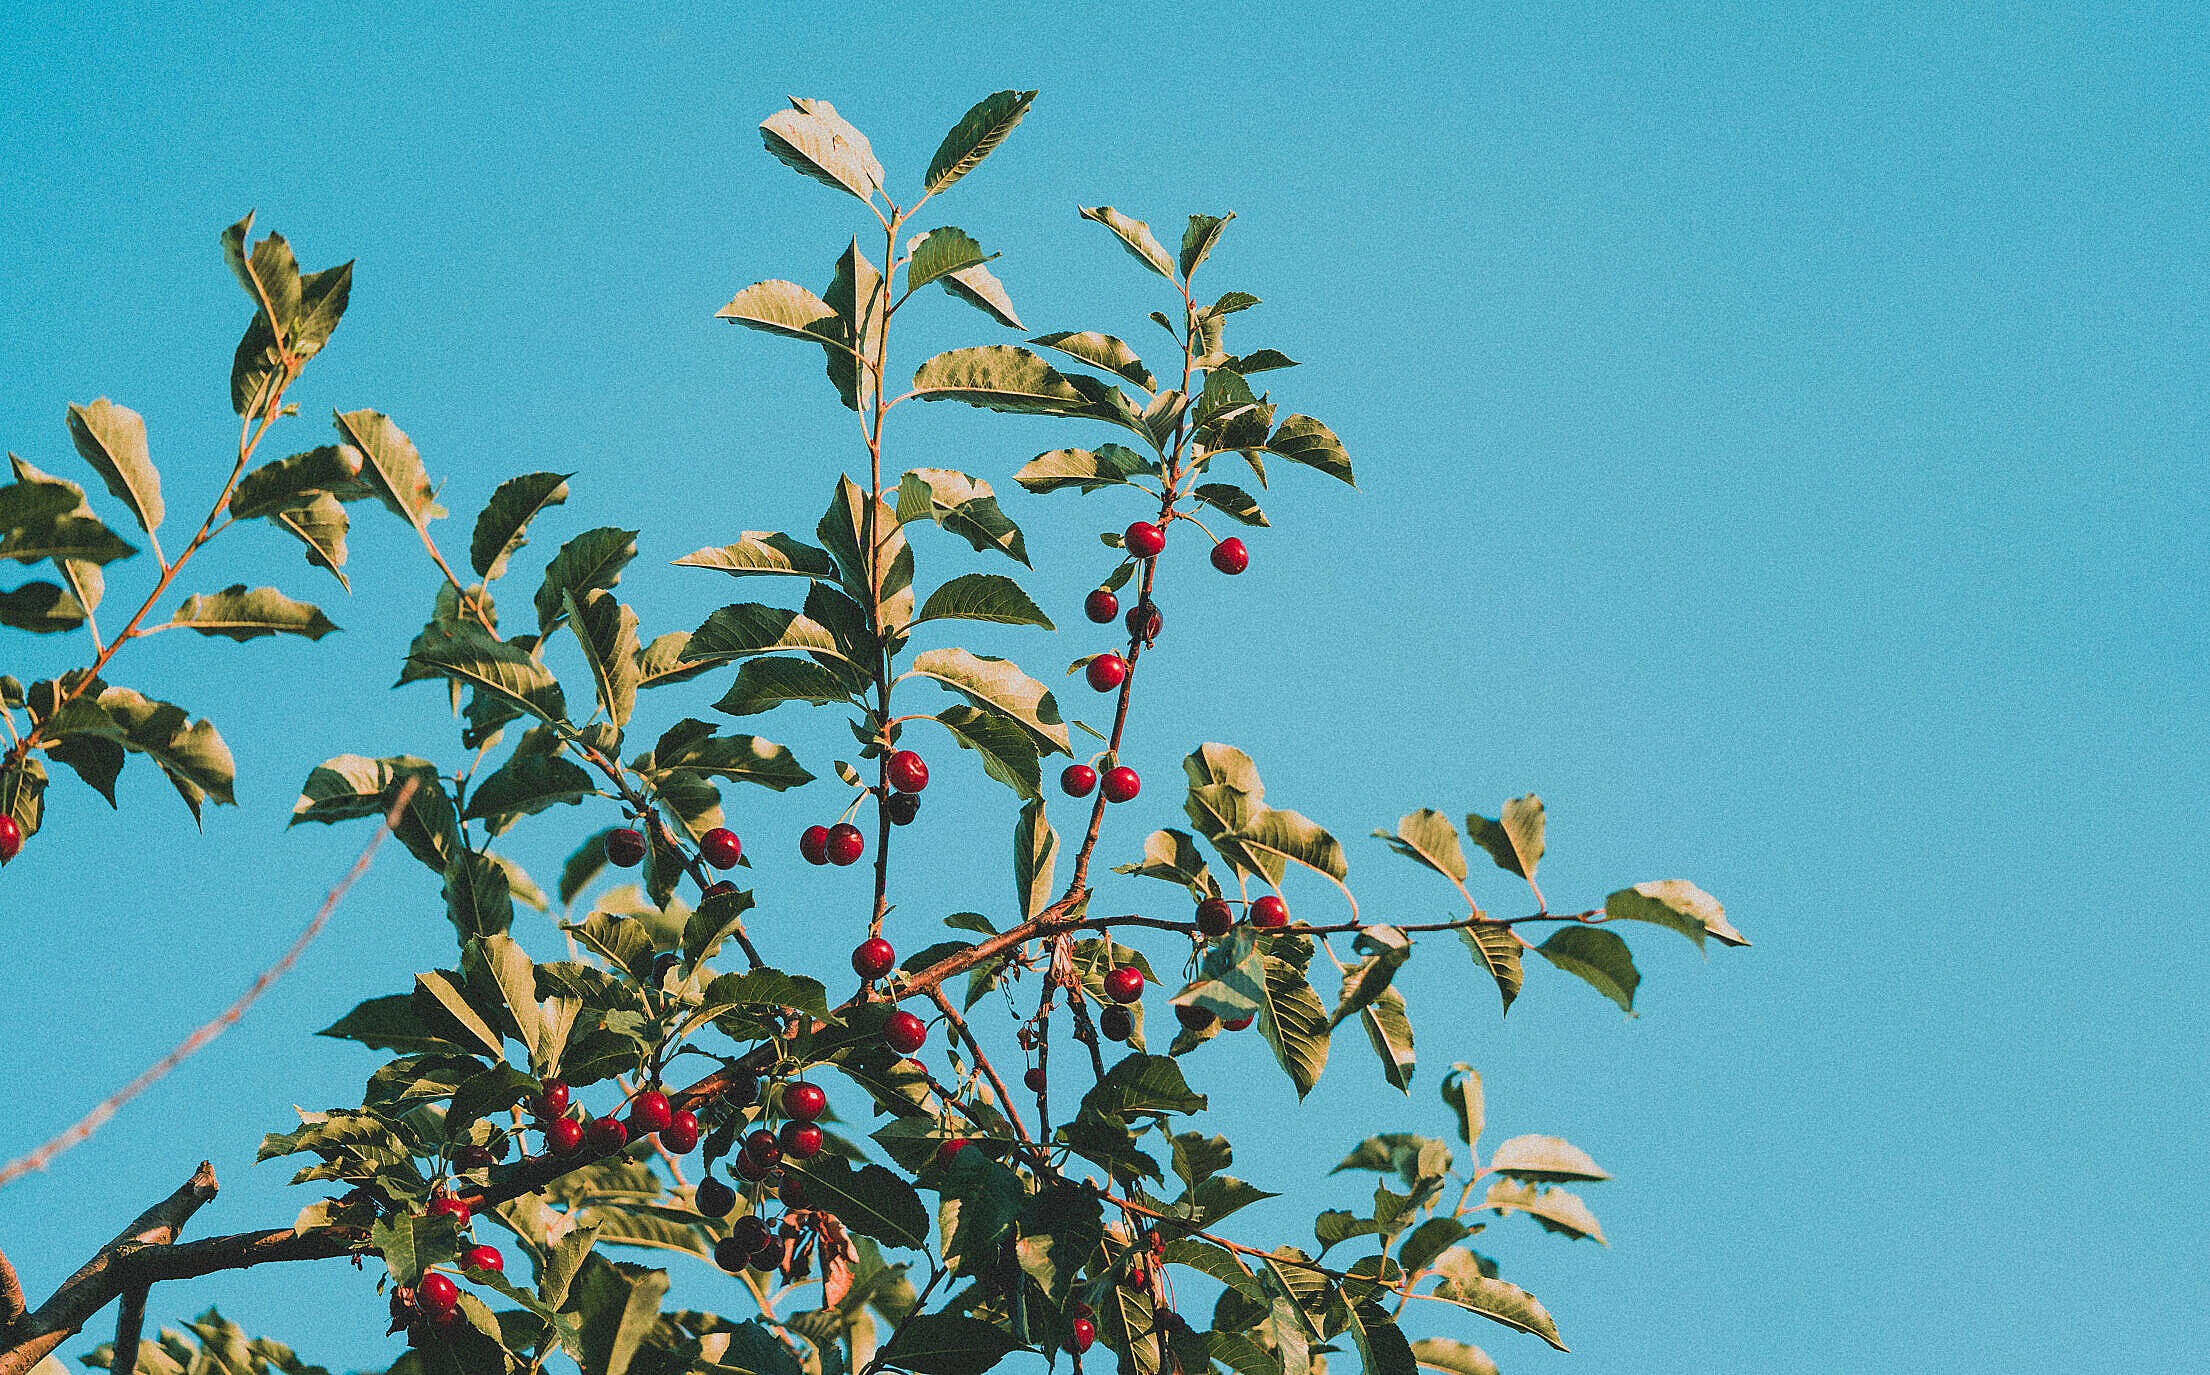 Fruit Tree with Cherries Free Stock Photo